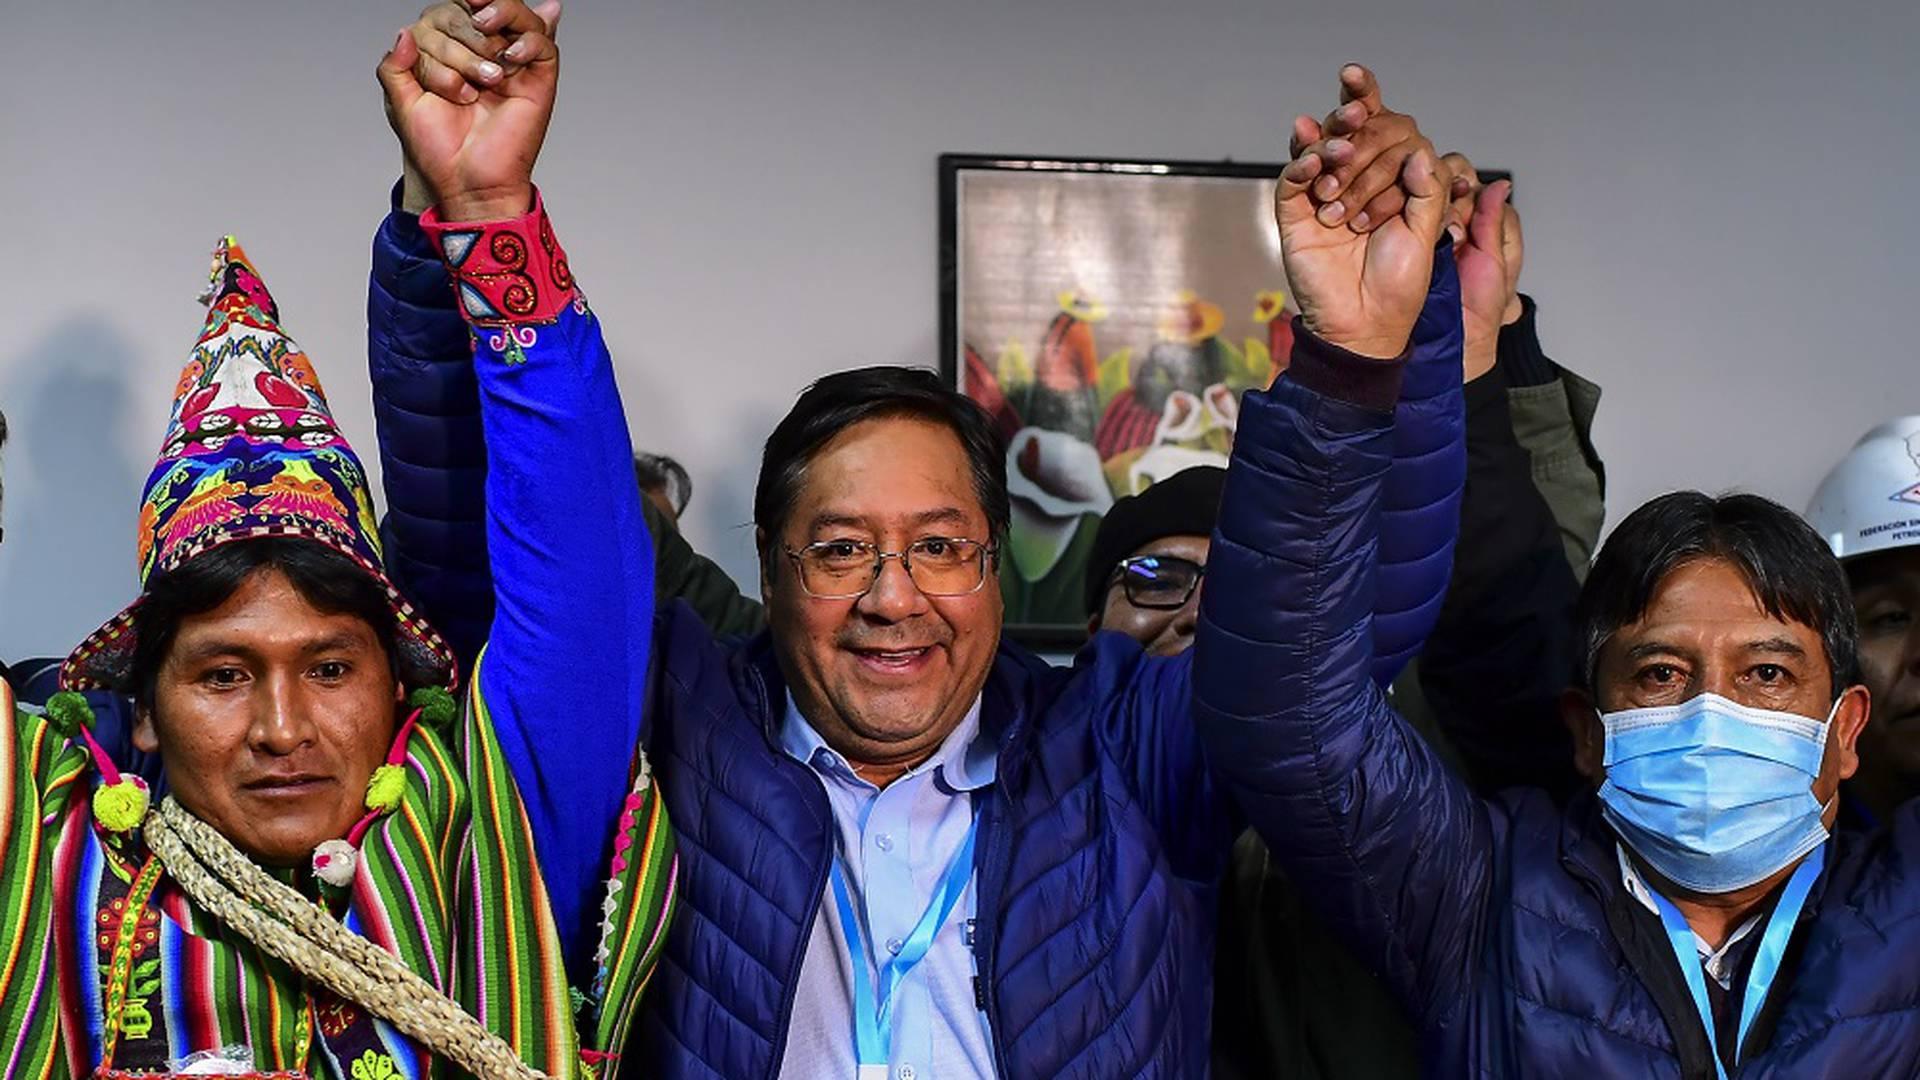 A casi un año del golpe, Bolivia eligió al candidato de Evo como presidente